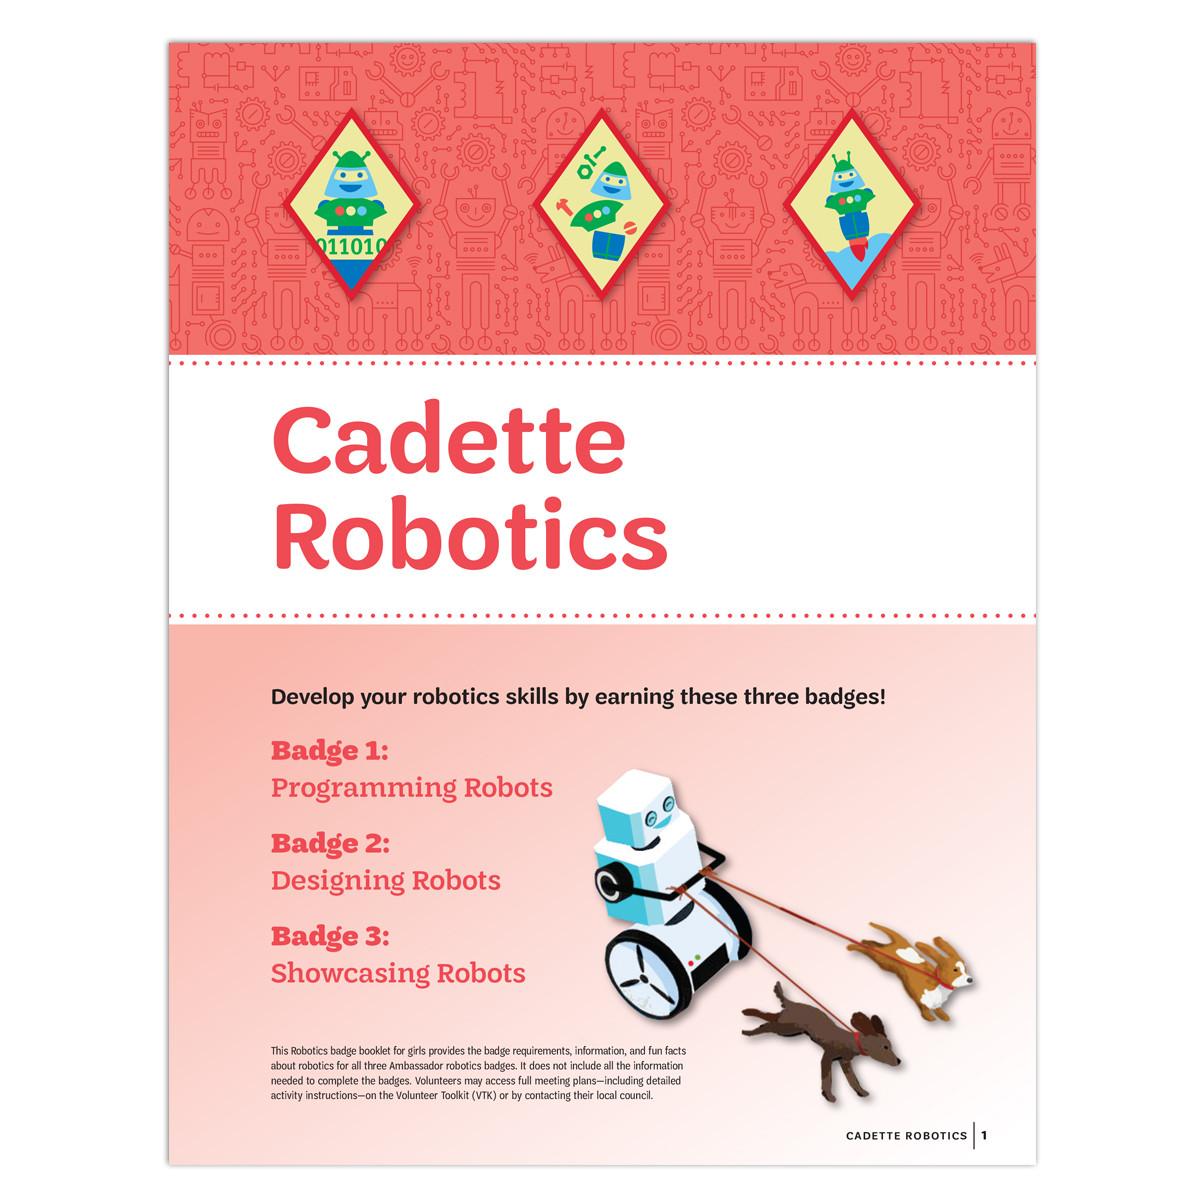 Cadette Robotics Image.jpg